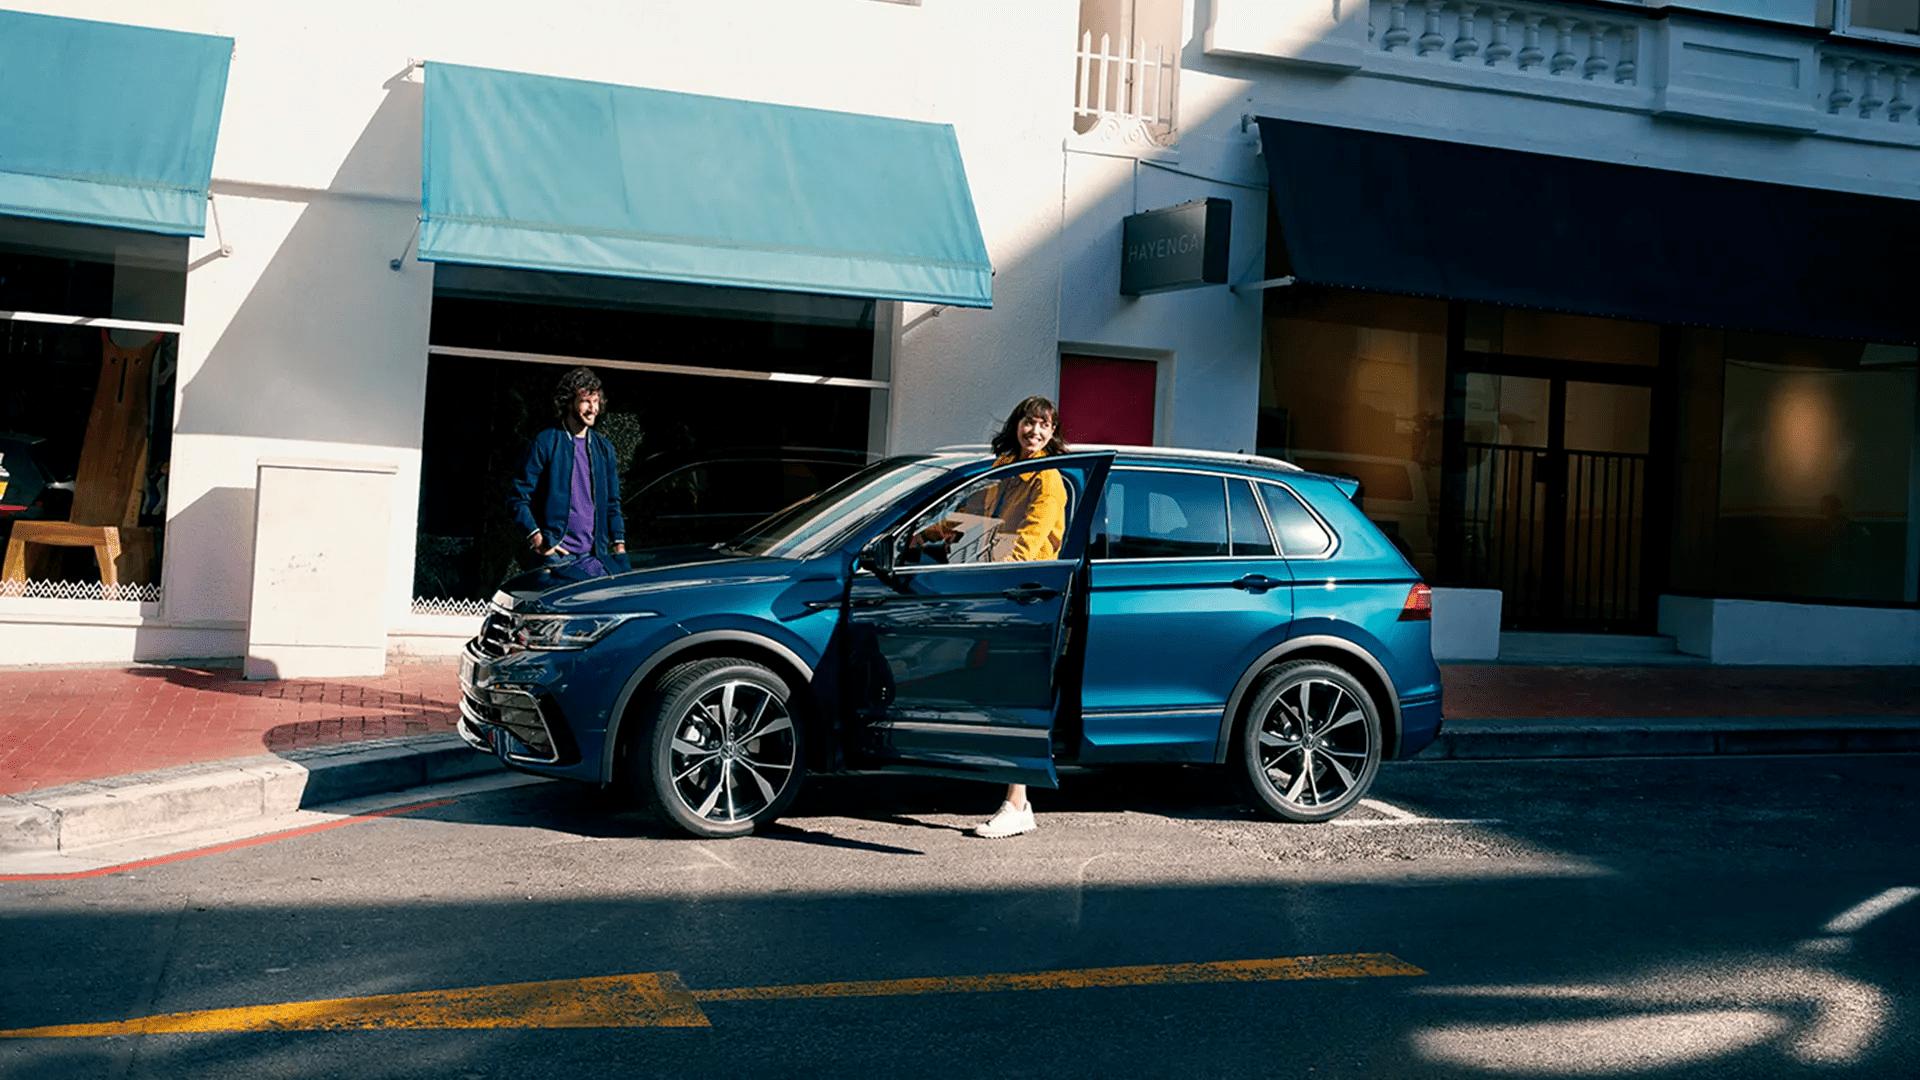 Volkswagen Tiguan - SUV de caractère - Garage D'Haiti 13012 Marseille VW